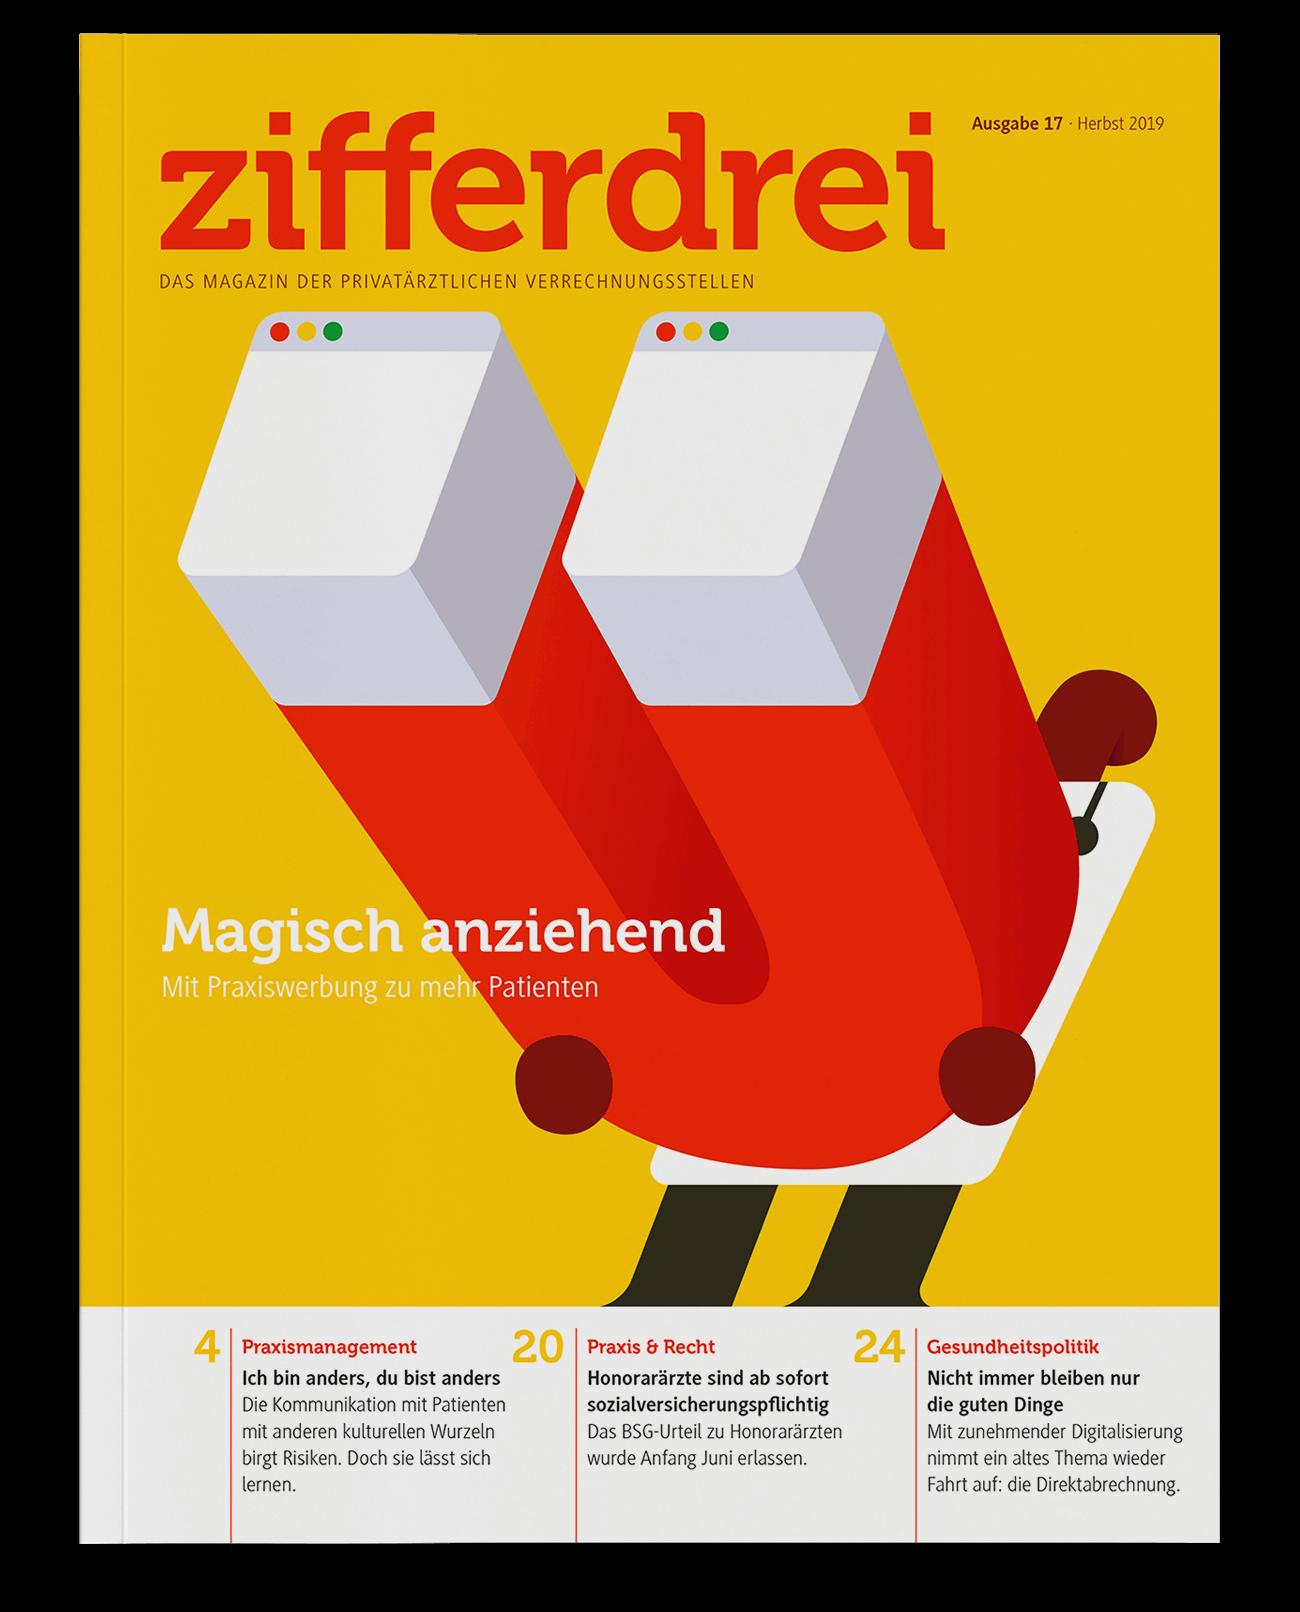 The magic of online promotion. Zifferdrei